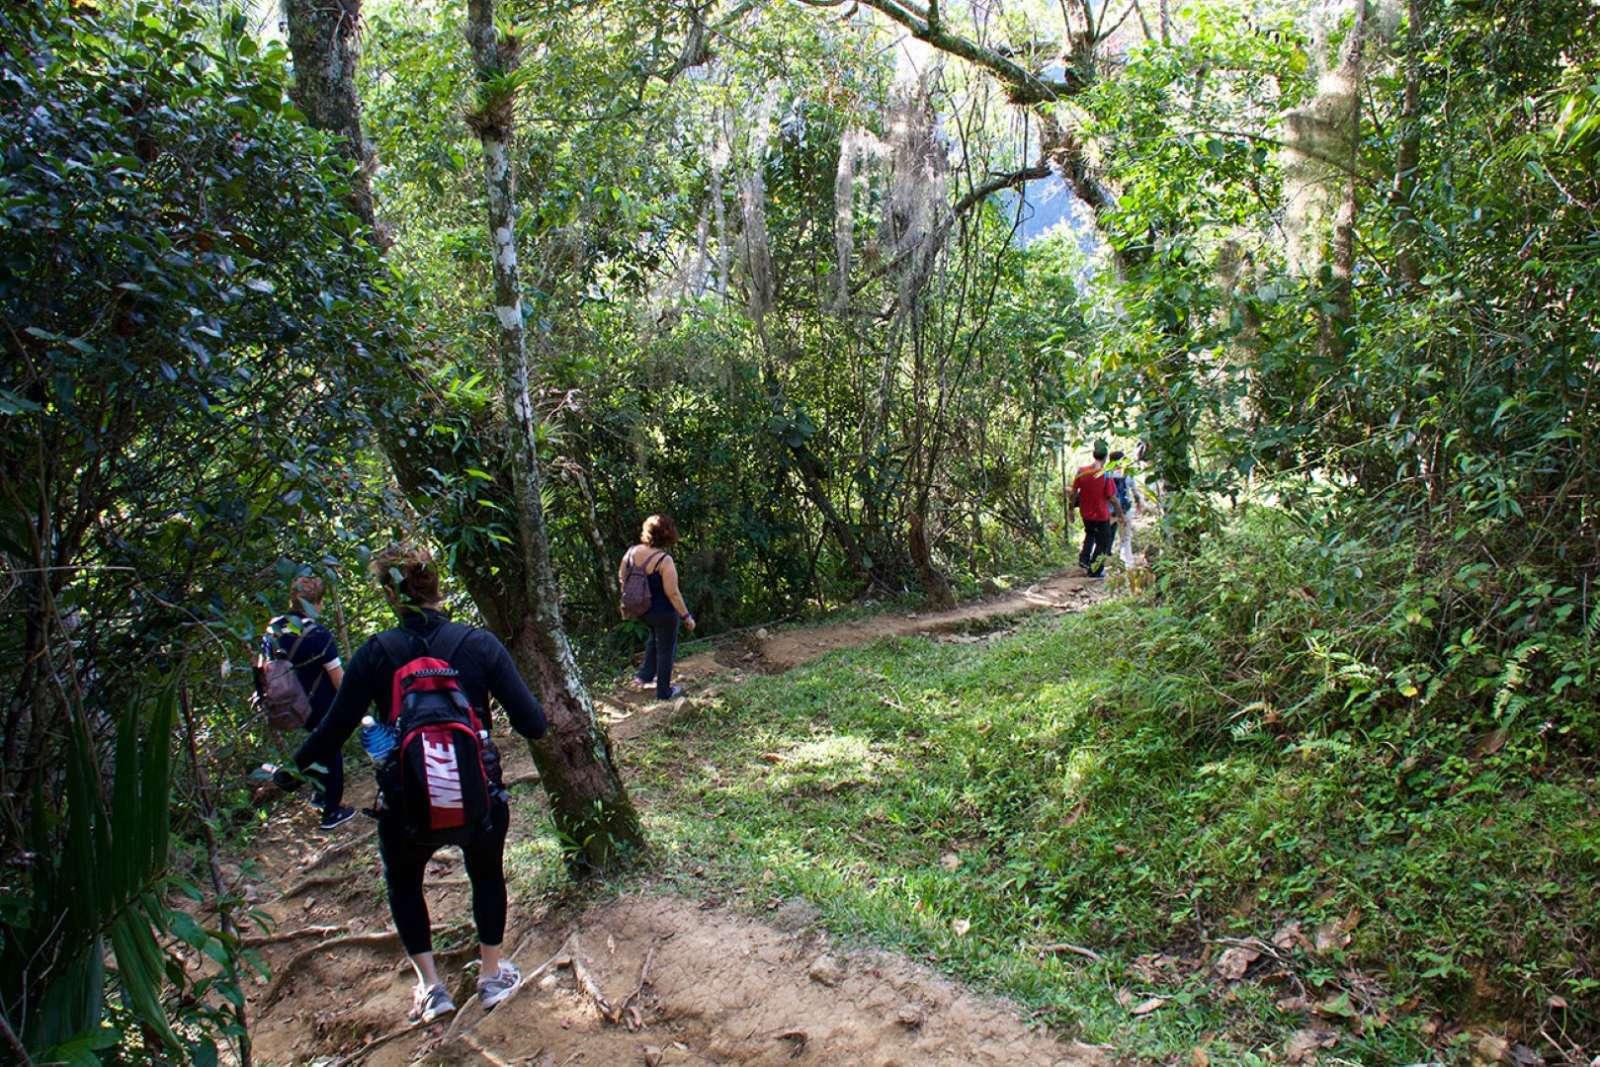 Trekking in the Sierra Maestra near Bayamo